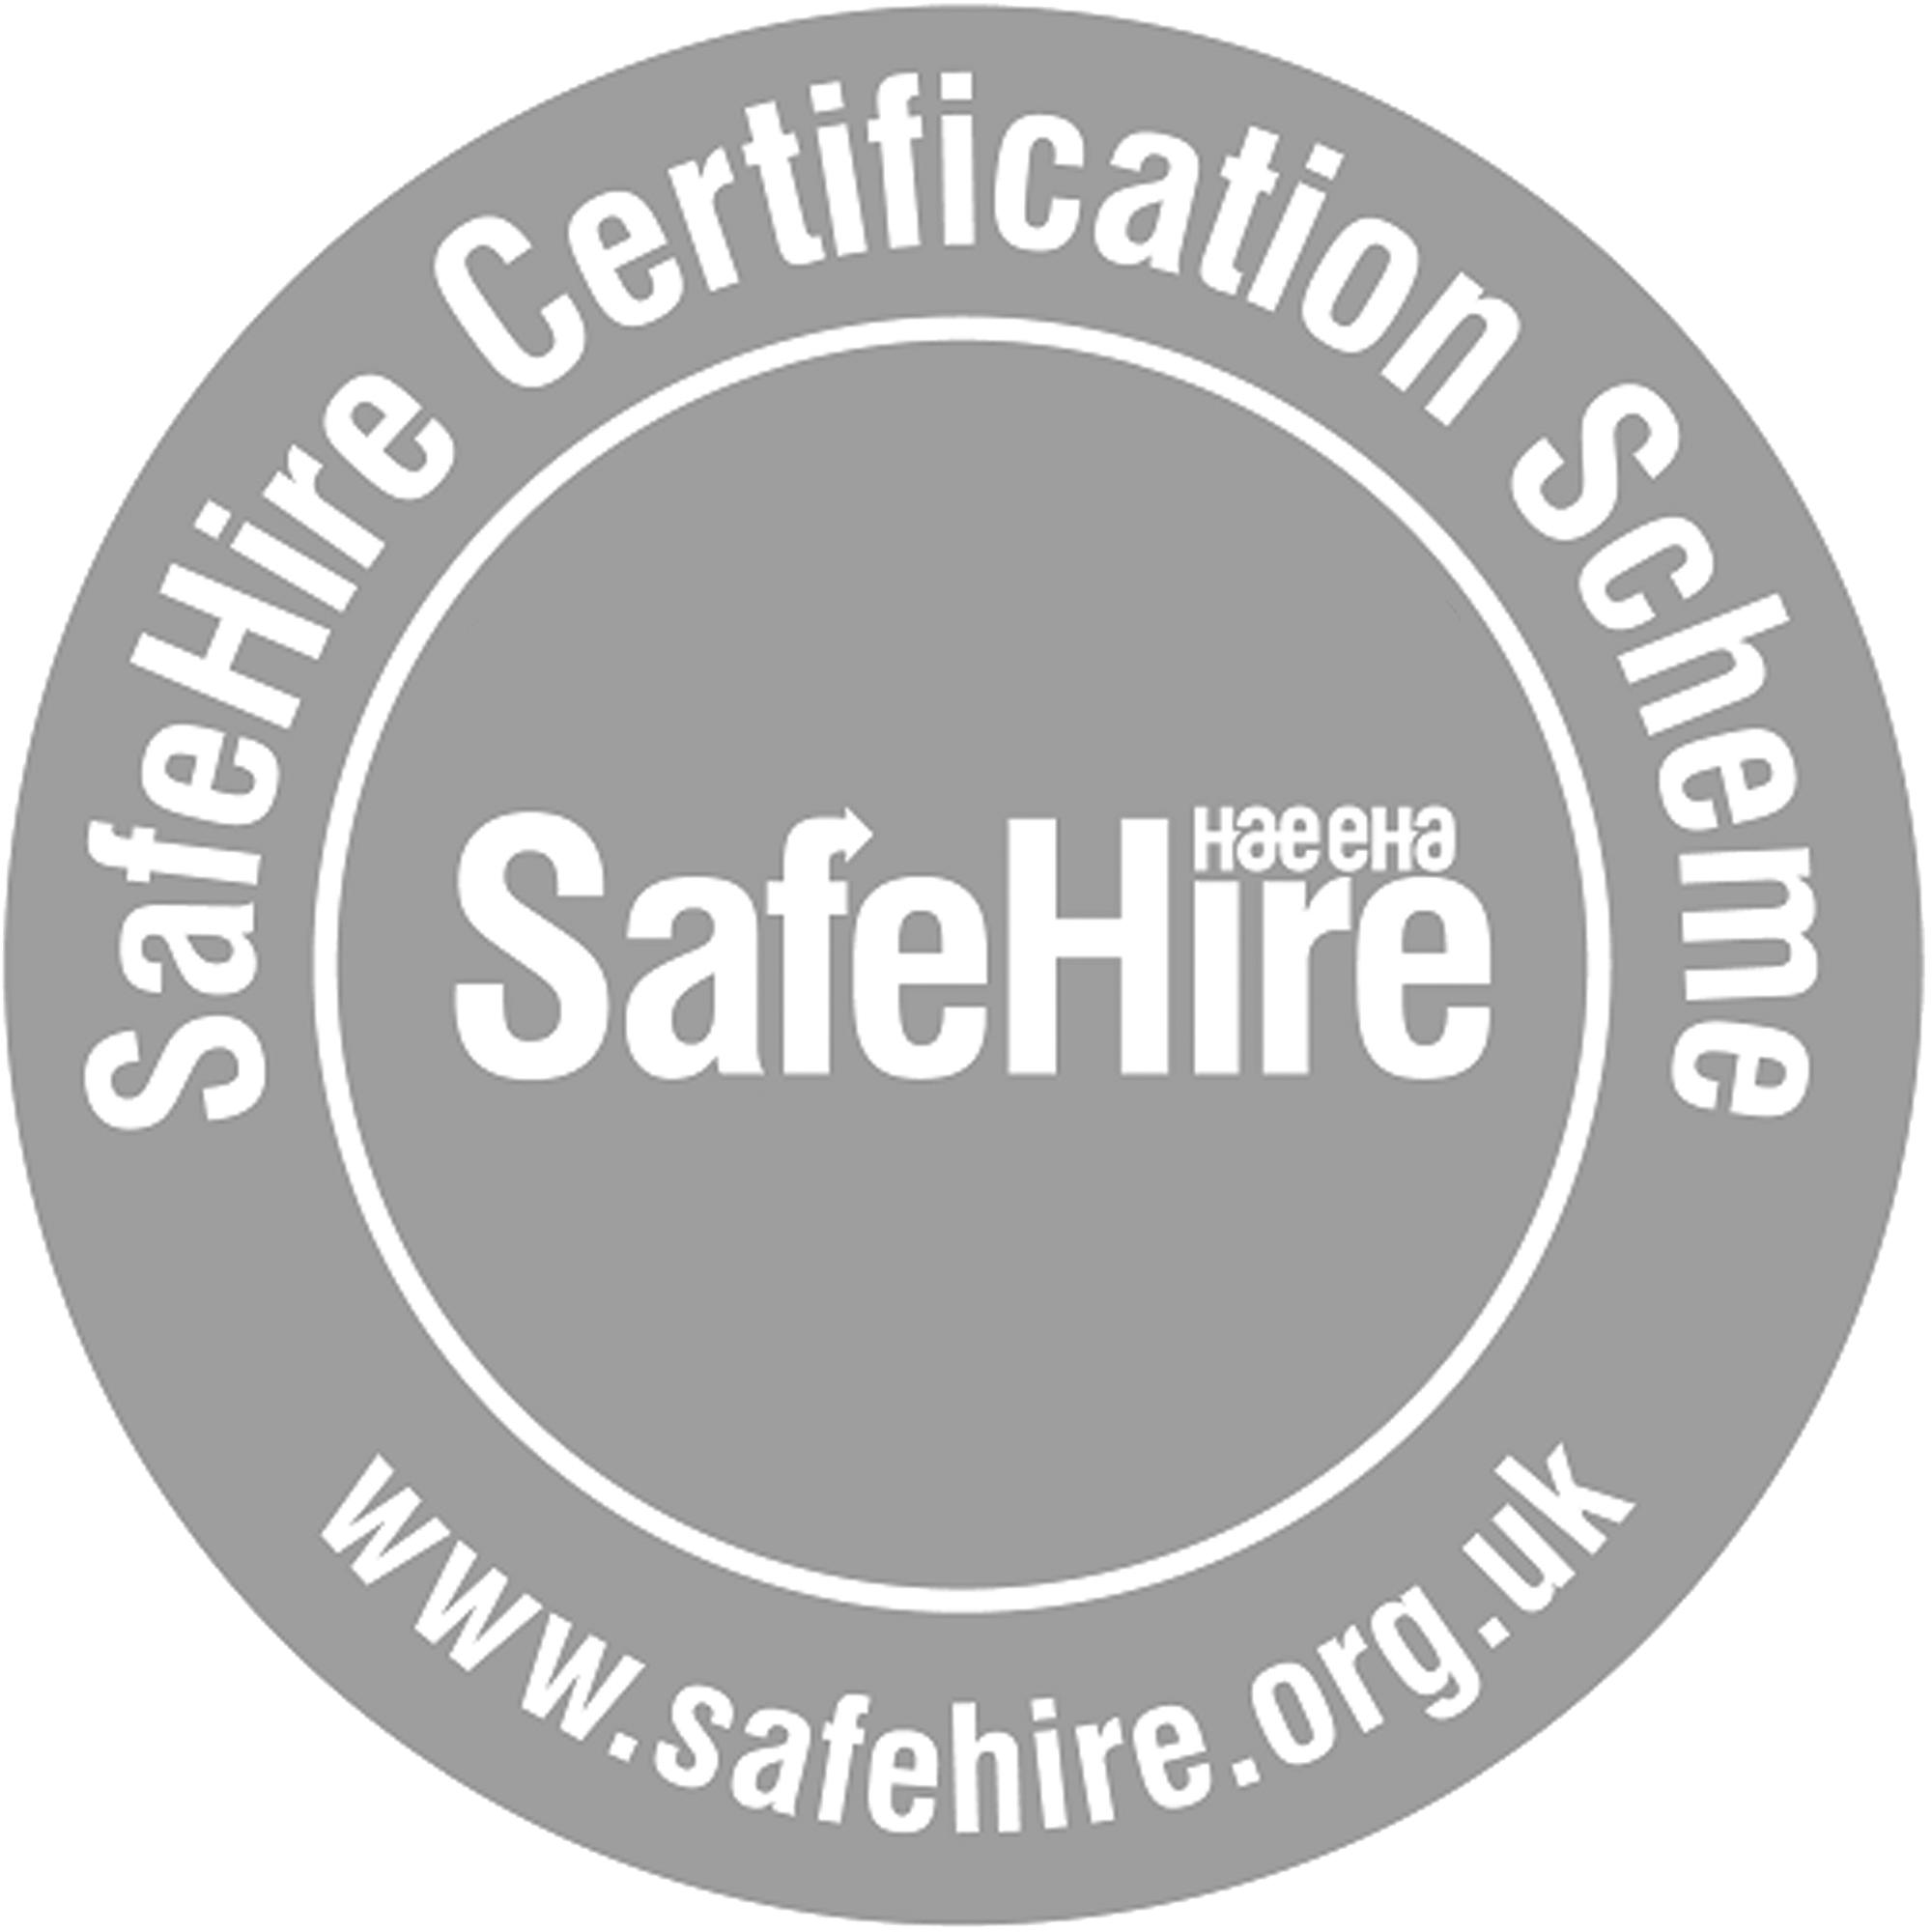 SafeHire Certification